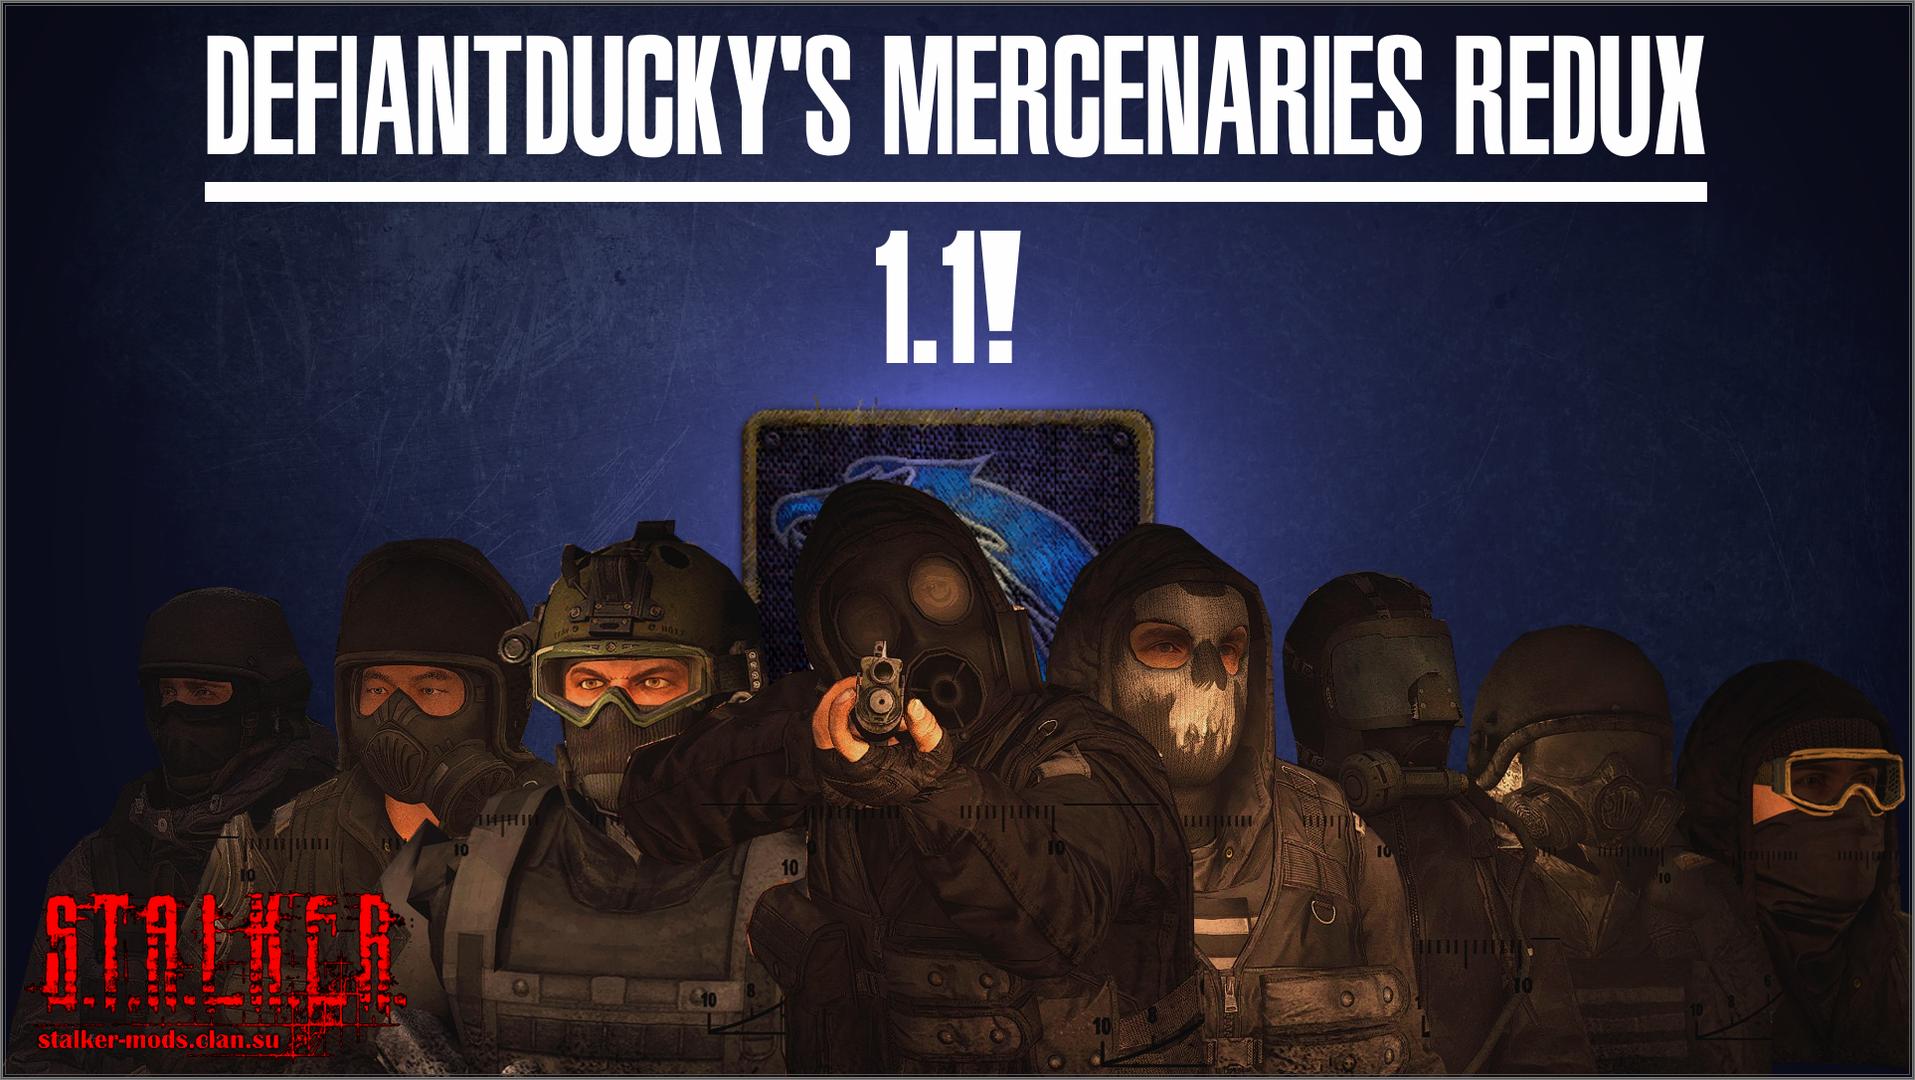 DefiantDucky's Mercenary Redux